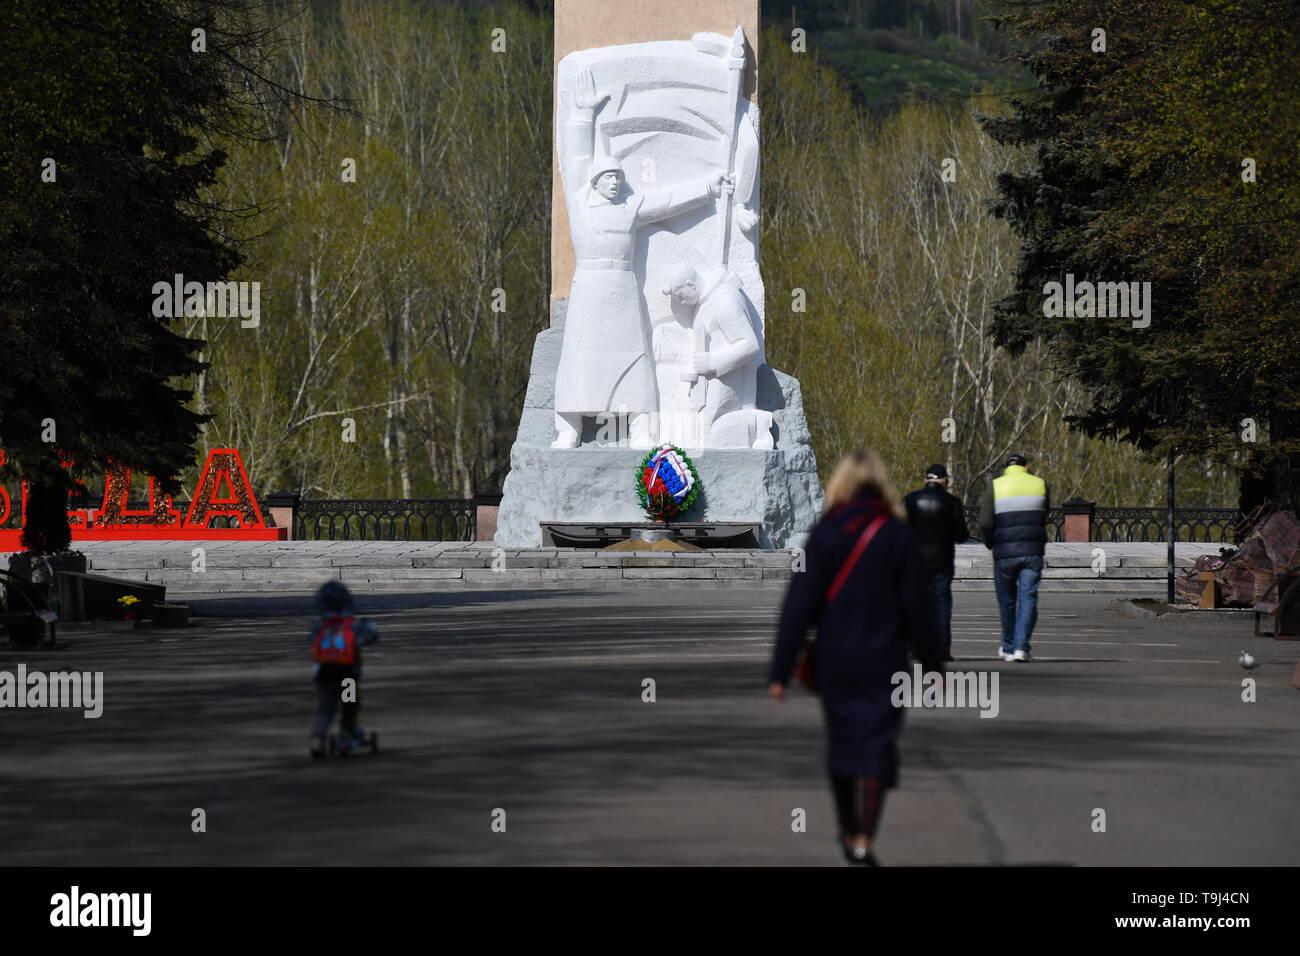 Kemerovo, Russia. 15th May, 2019. KEMEROVO, RUSSIA - MAY 15, 2019: A monument to Kuzbass Soldiers killed in World War II (Glory Memorial) in Vesennyaya Street. Kirill Kukhmar/TASS Credit: ITAR-TASS News Agency/Alamy Live News - Stock Image